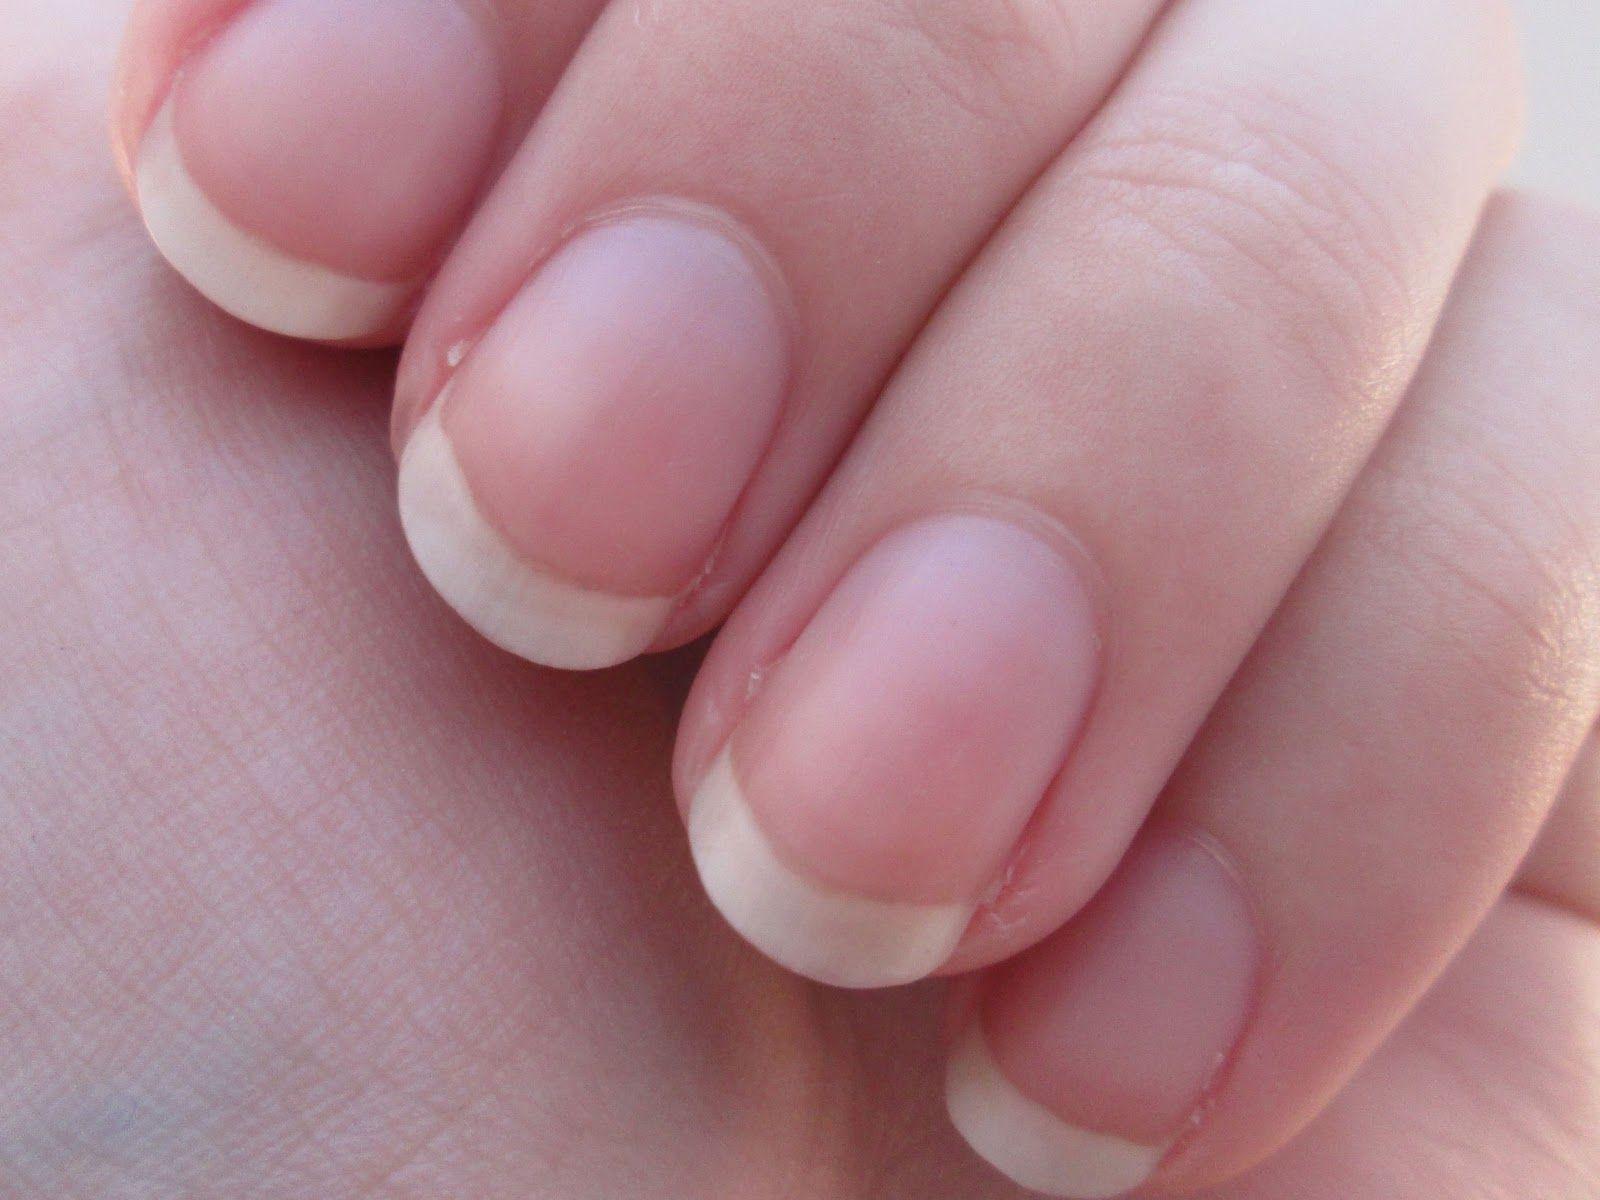 Img 1010 Jpg 1600 1200 Fingernail Health Signs Moons On Fingernails Nail Health Signs